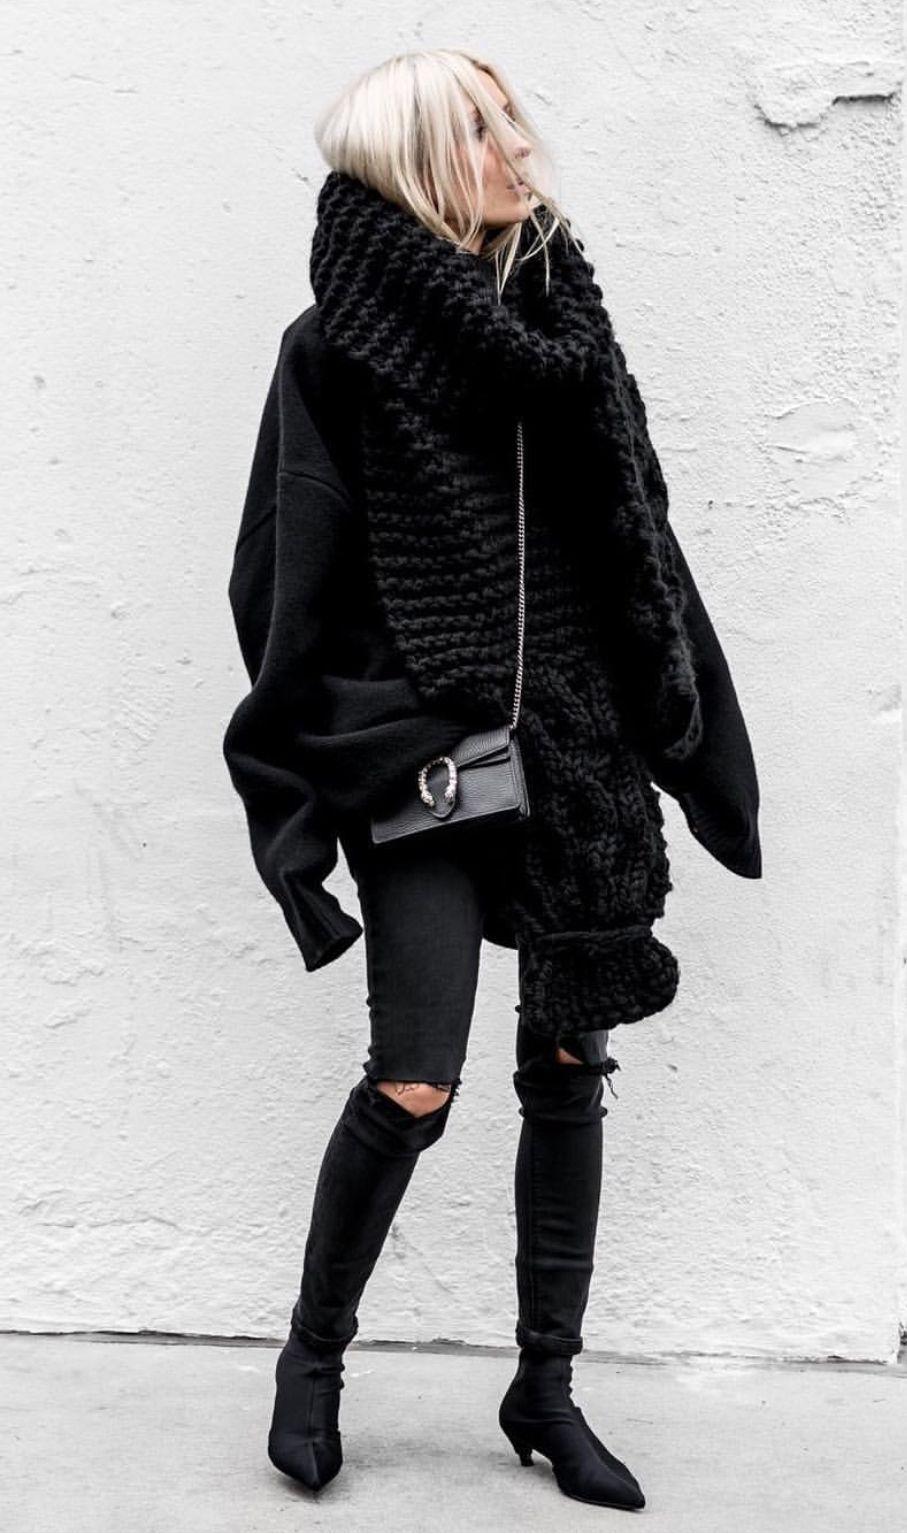 Pinterest Deborahpraha All Black Winter Outfit Fashion Trend Black Fashion Style [ 1534 x 907 Pixel ]